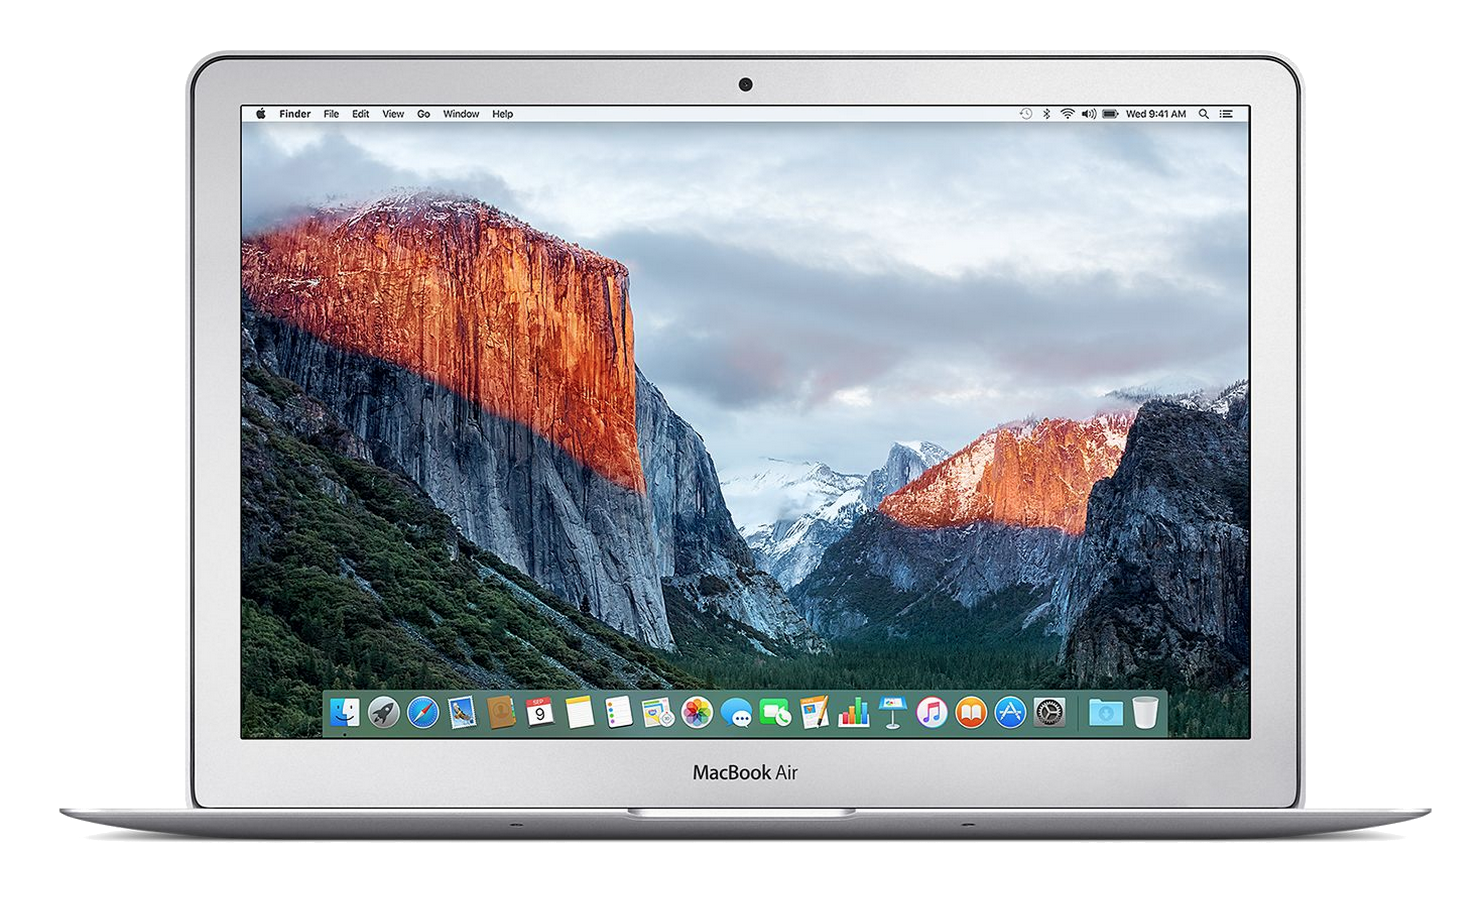 Macbook PNG Image - PurePNG | Free transparent CC0 PNG ...